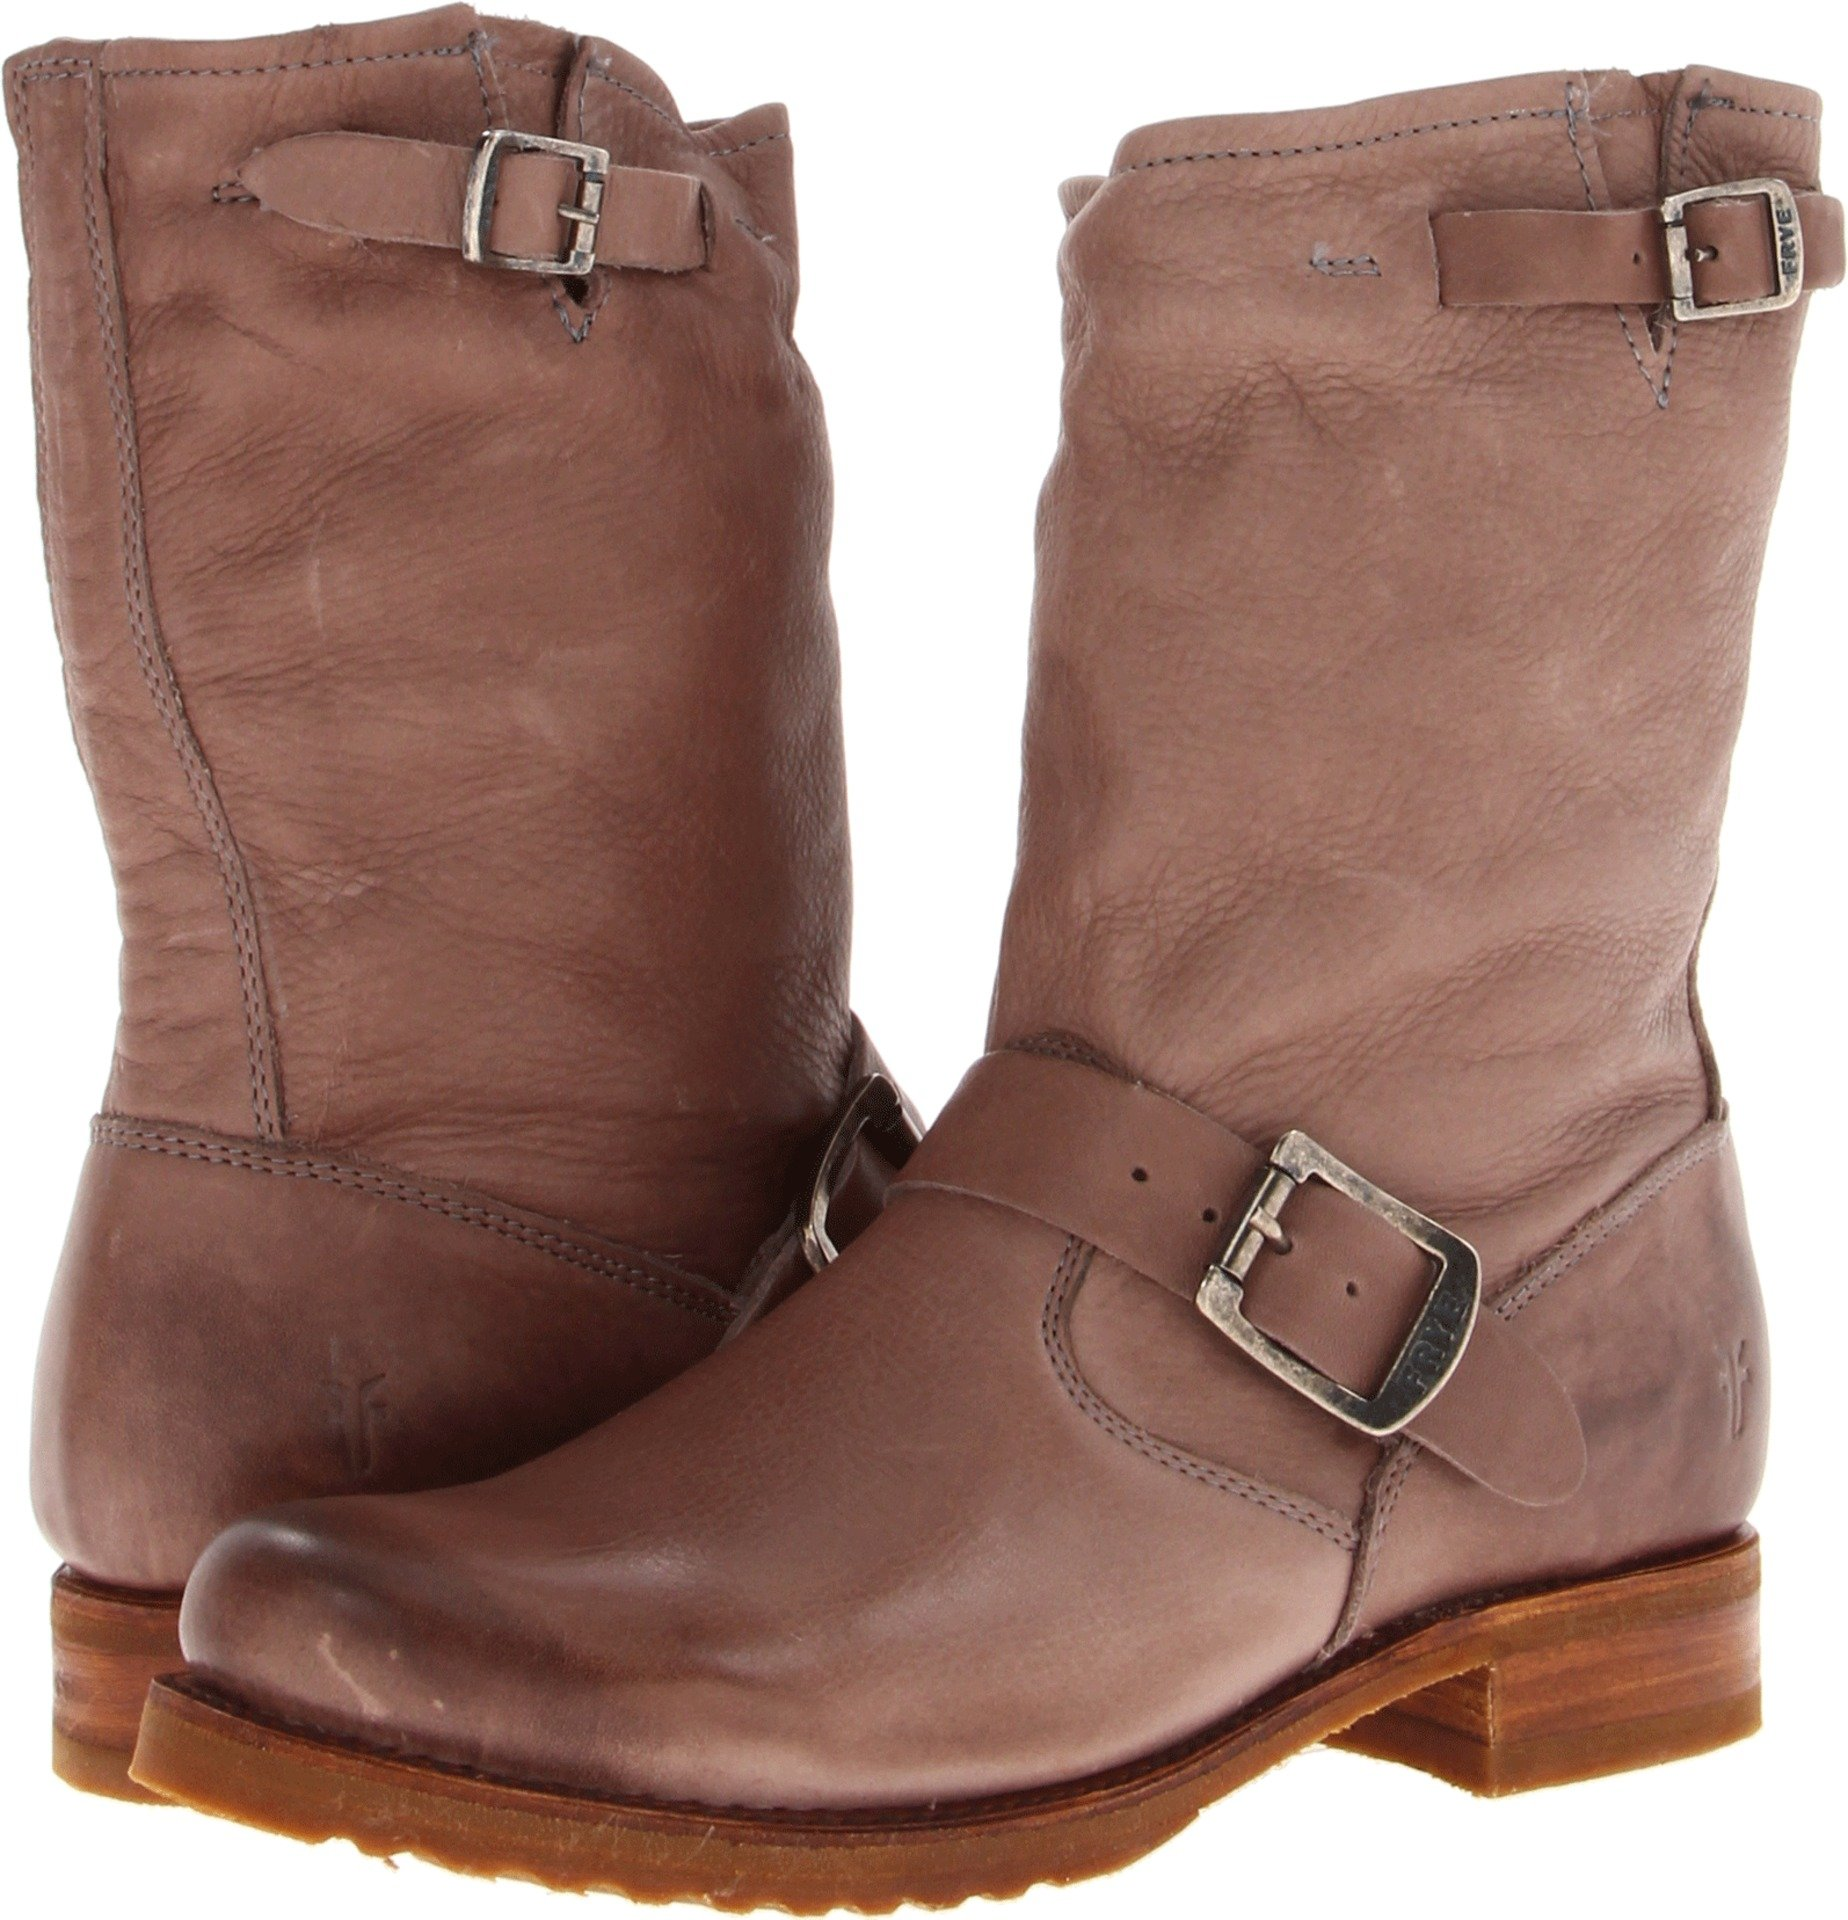 FRYE Women's Veronica Short Boot, Grey Soft Vintage Leather, 5.5 M US